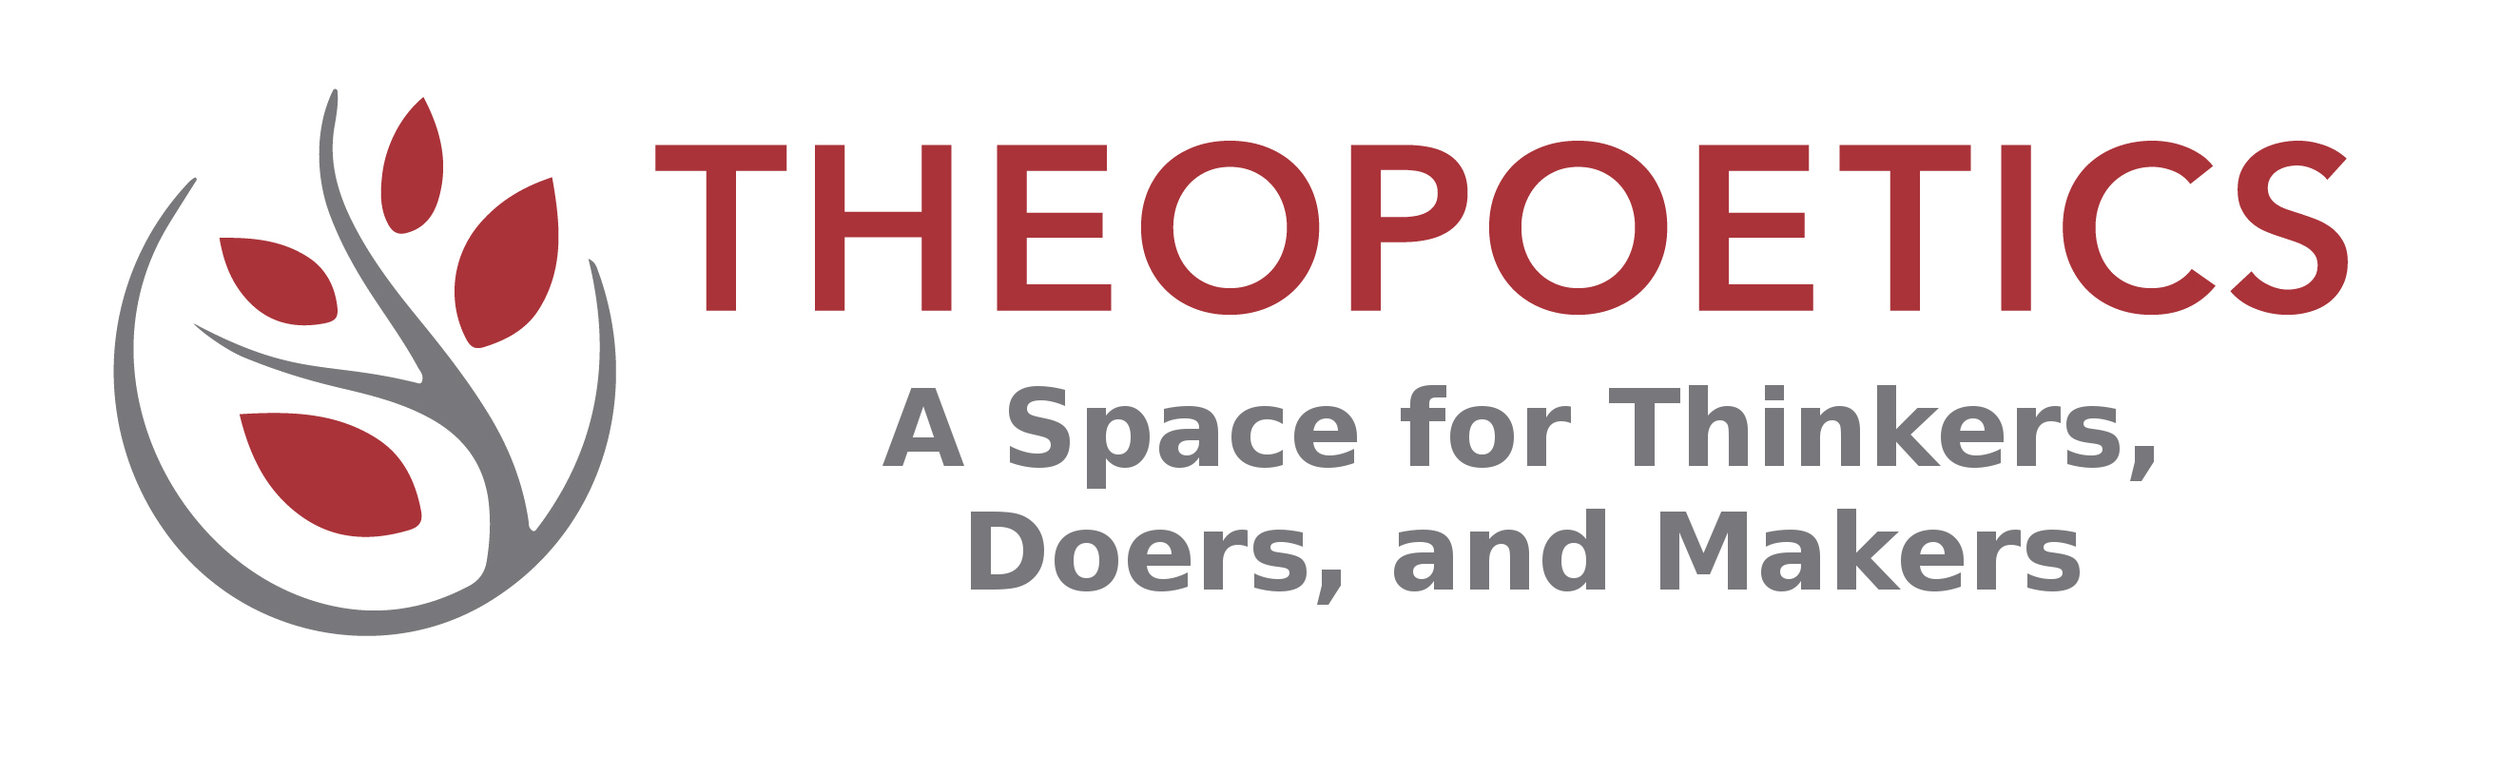 Theopoetics Conference Logo.jpg